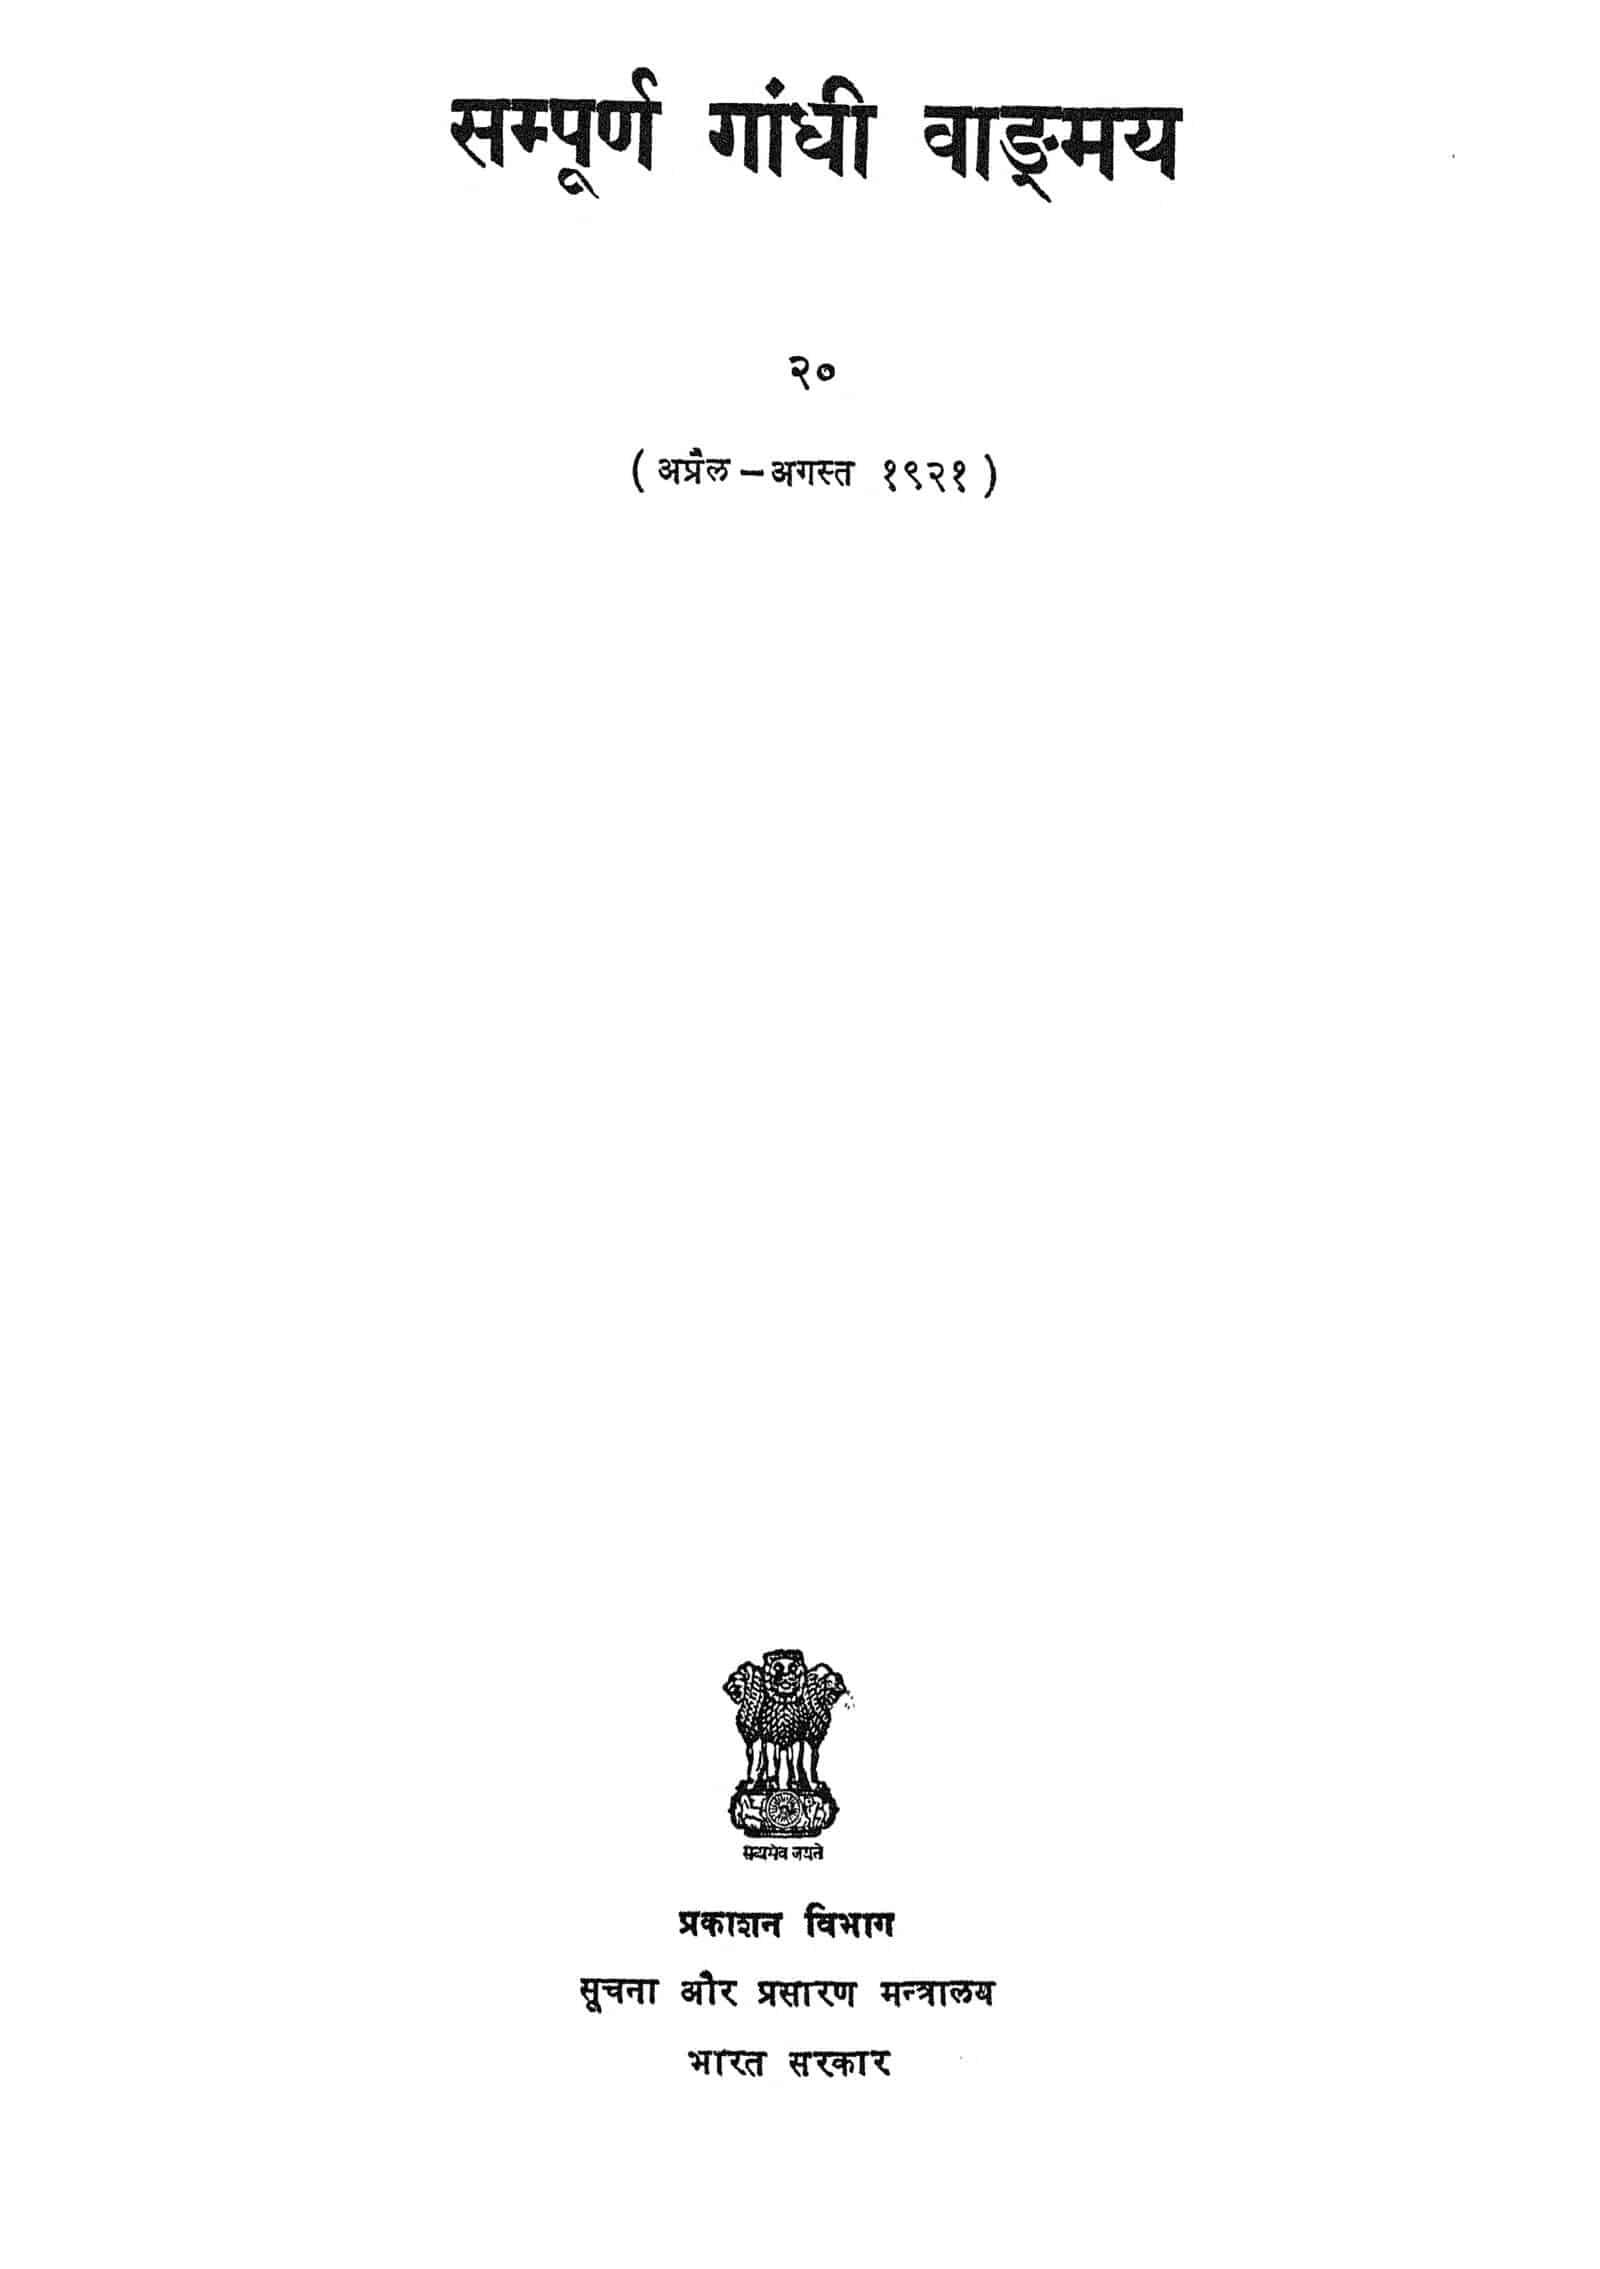 Book Image : सम्पूर्ण गांधी वाङ्मय भाग 20 - Sampuna Gandhi Vangmay Bhag 20